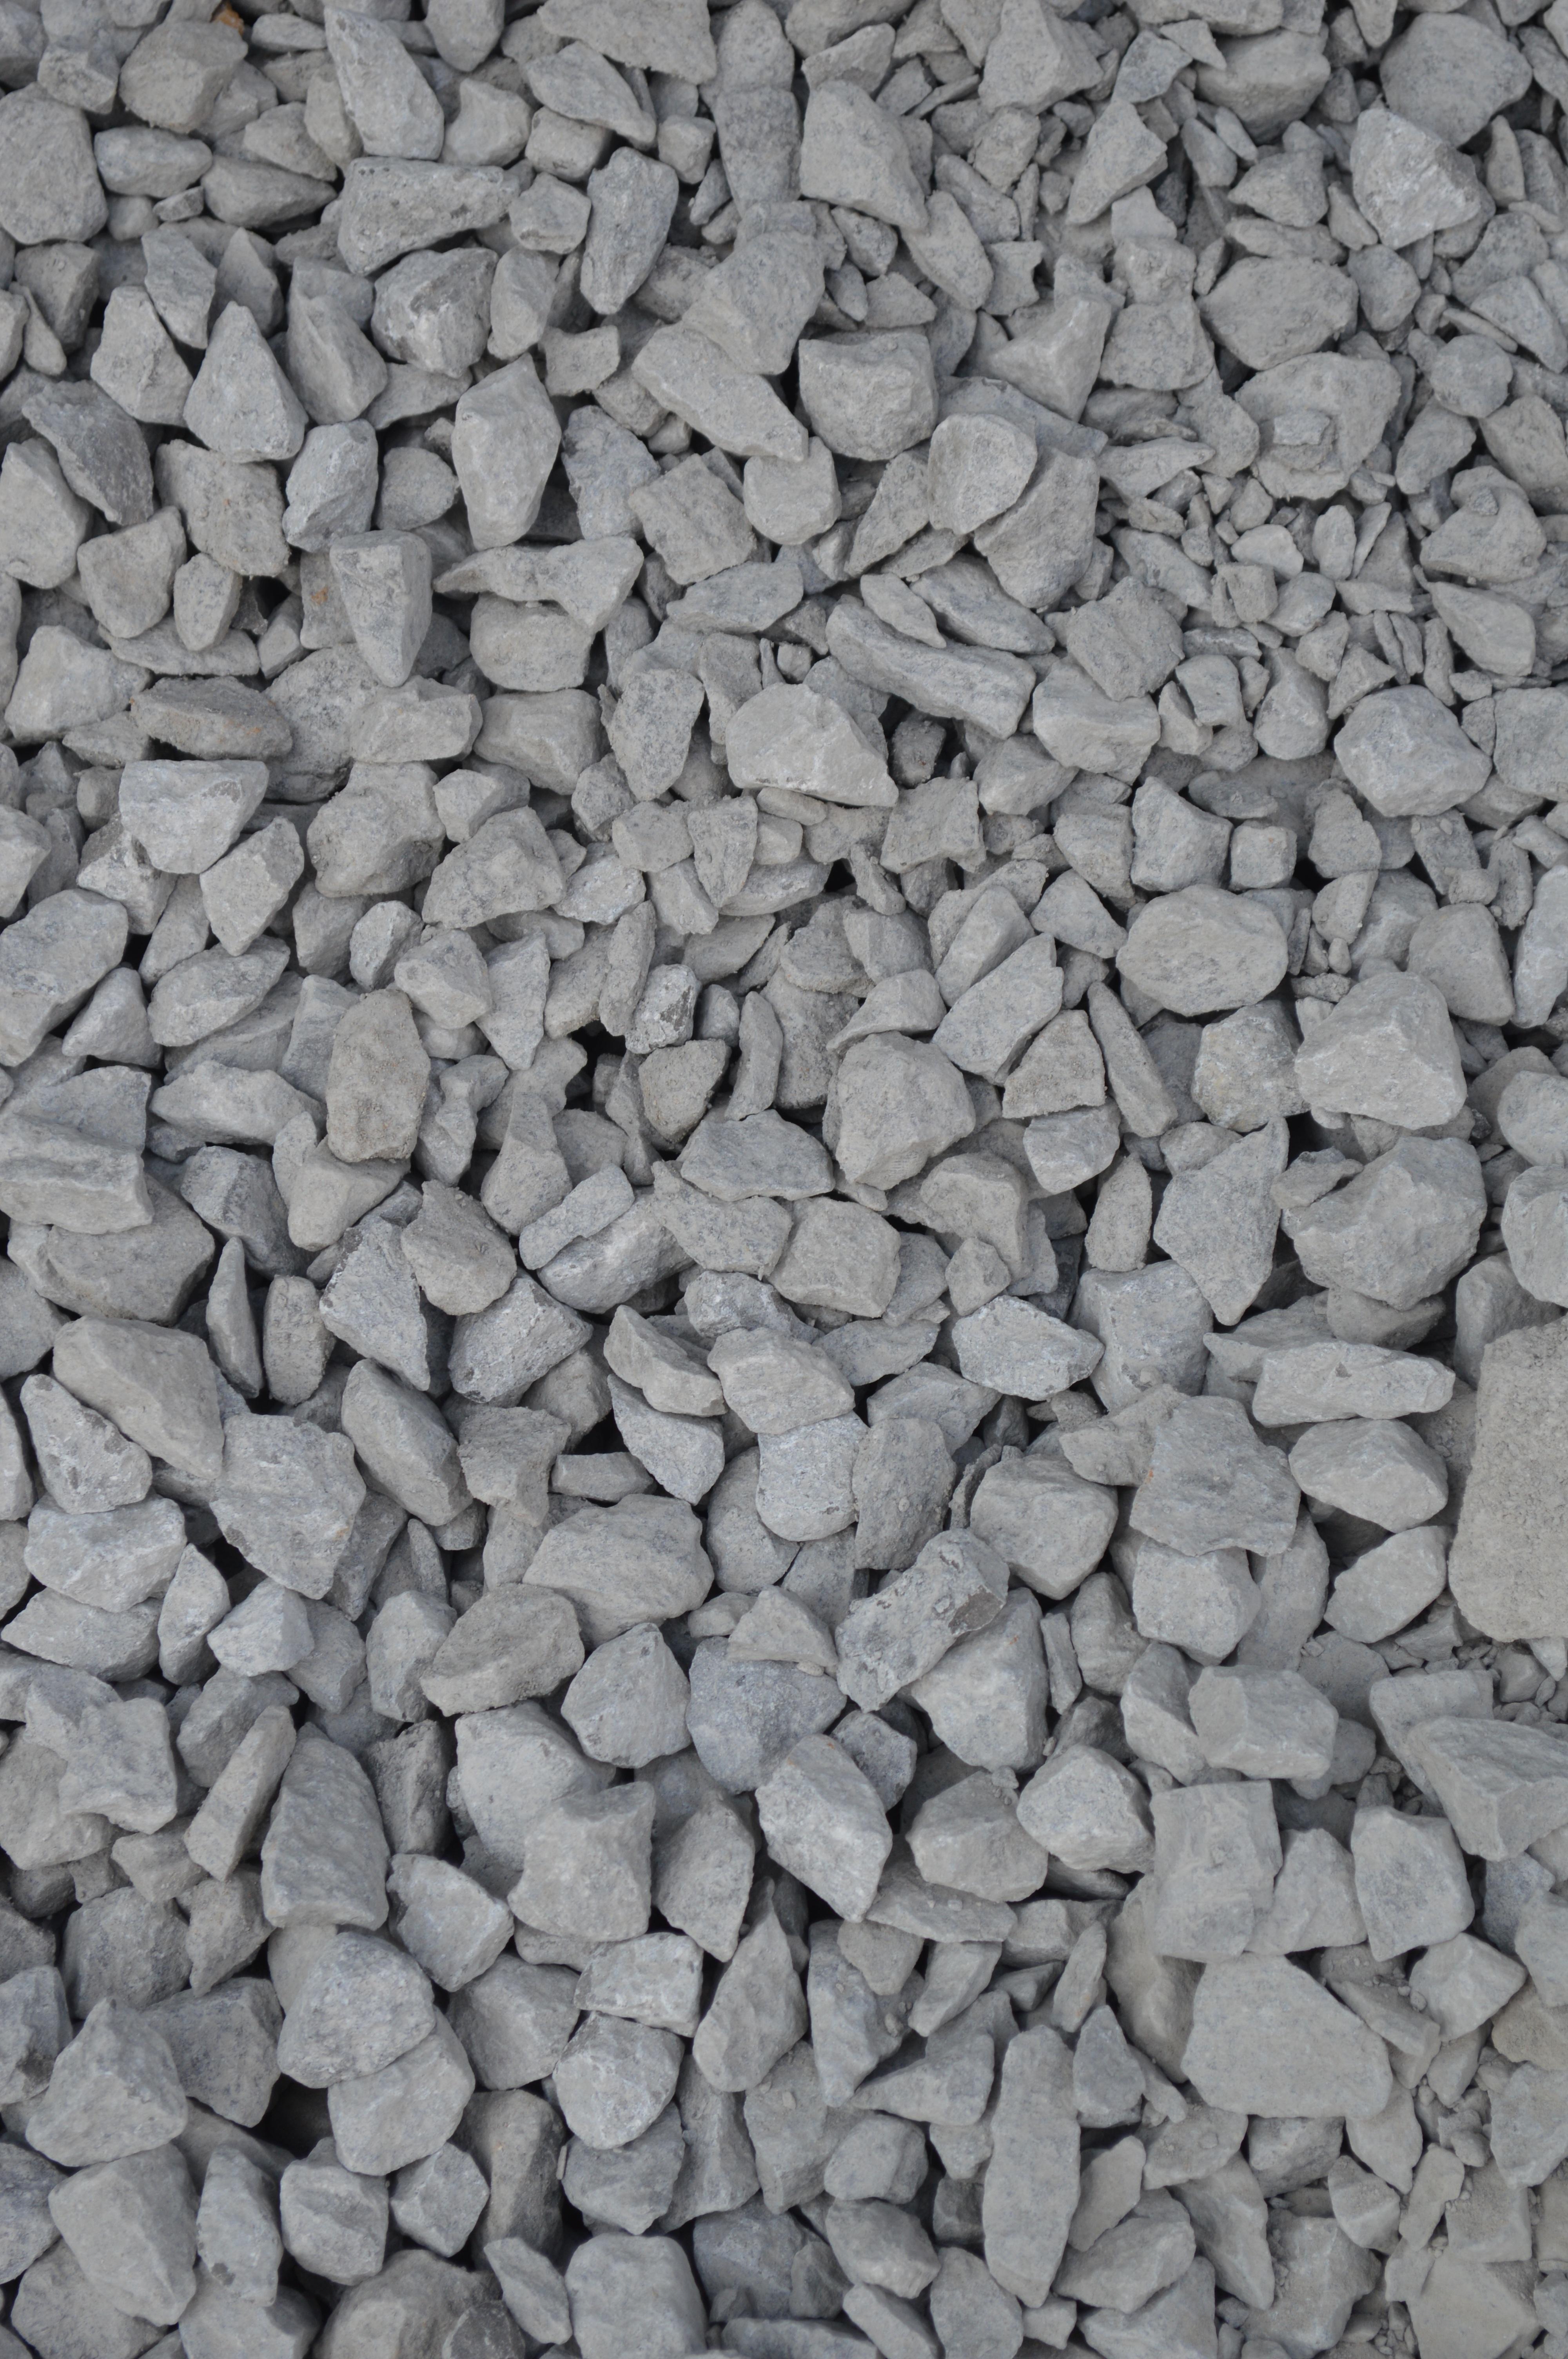 Rock Texture Floor Wall Asphalt Soil Gray Stone Material Concrete Rocks Grey Stones Rubble Gravel